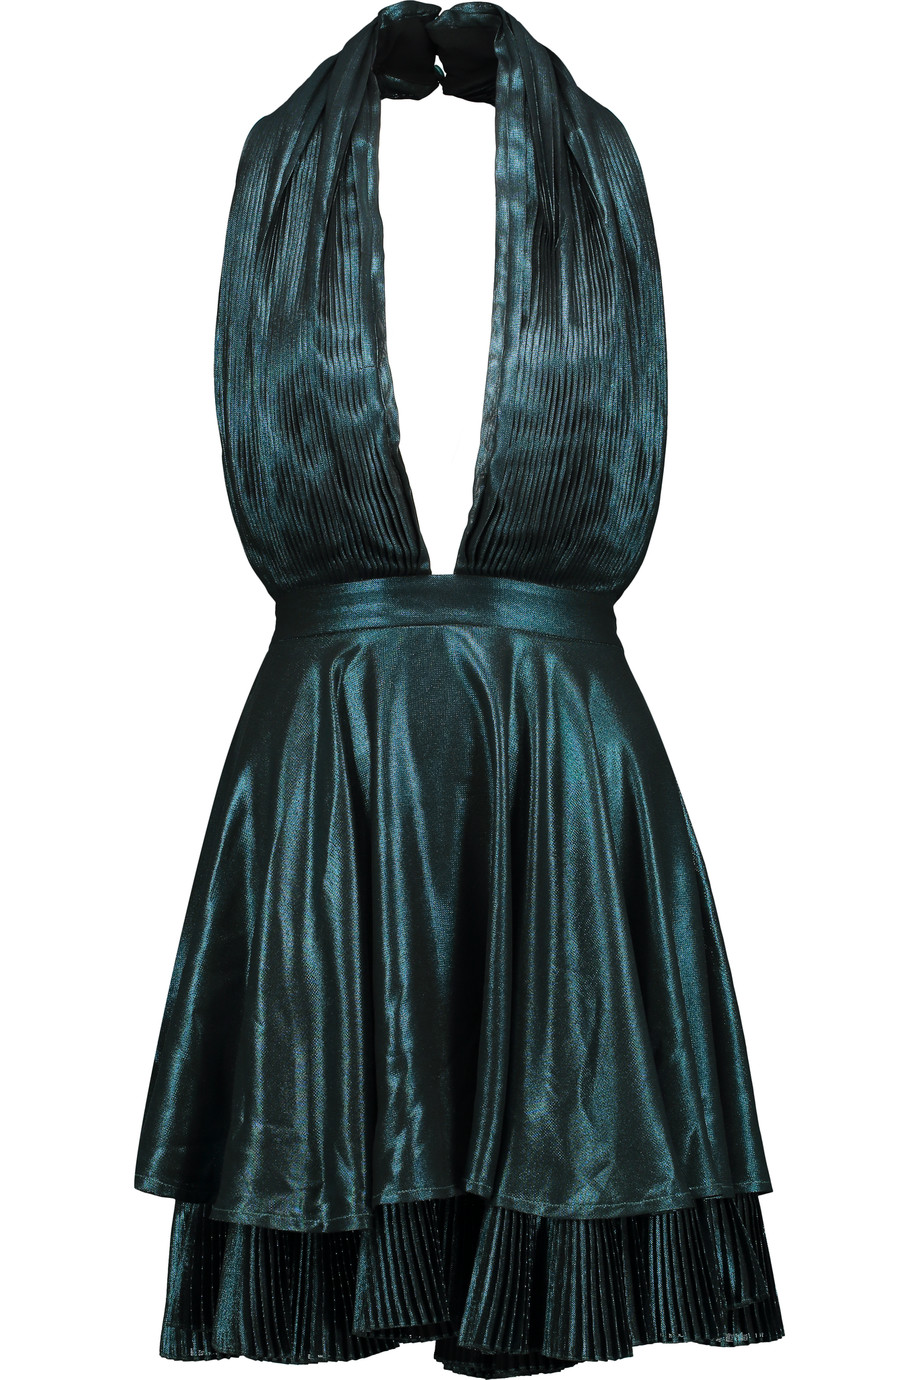 Outnet Wedding Dresses 97 Fabulous Buy Now